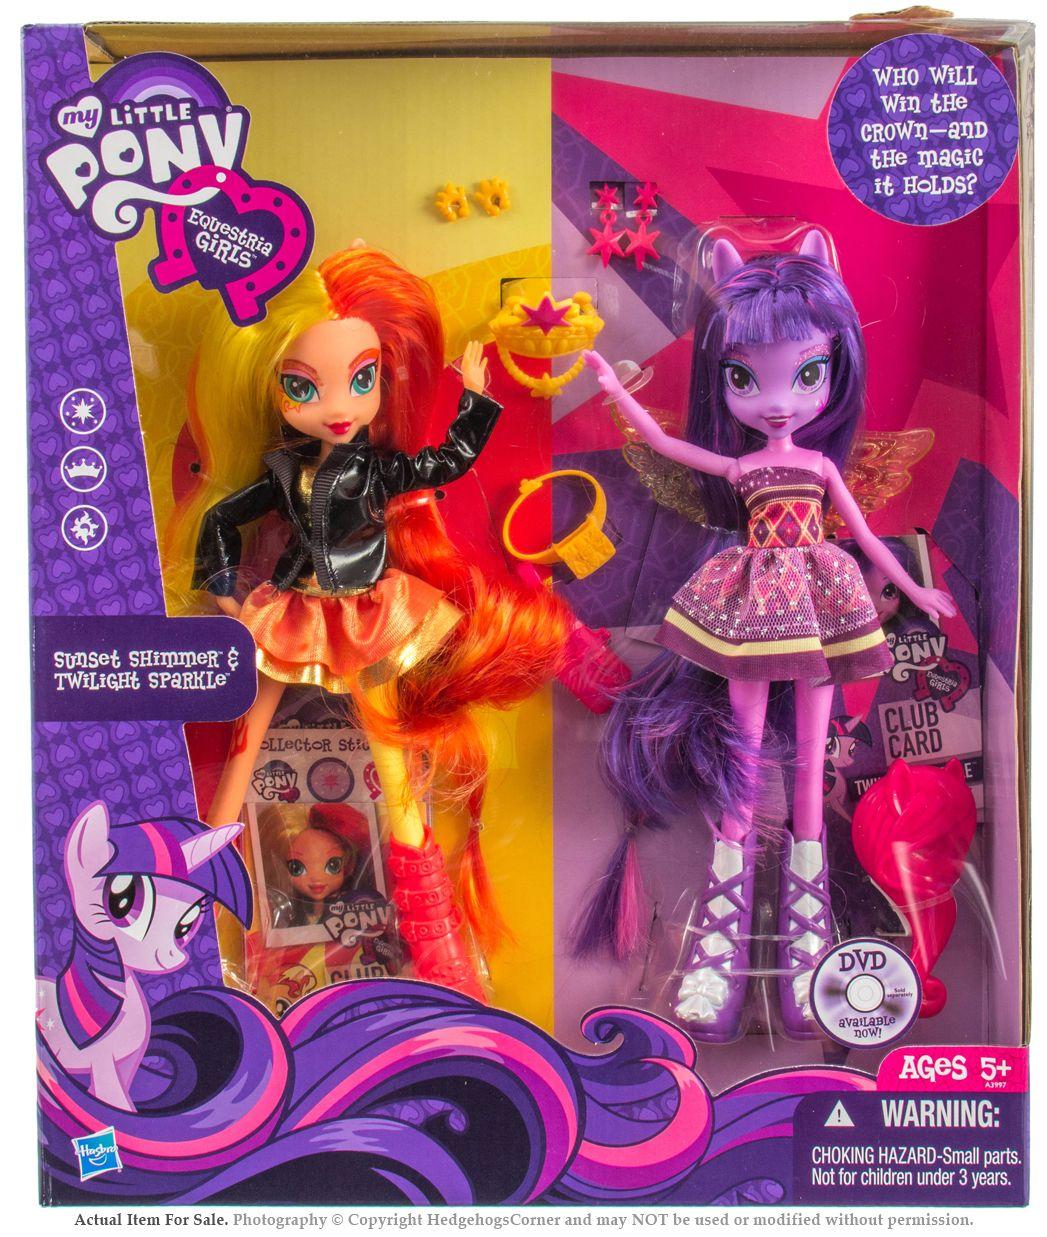 My Little Pony Equestria Girls Dolls Sunset Shimmer Twilight Sparkle